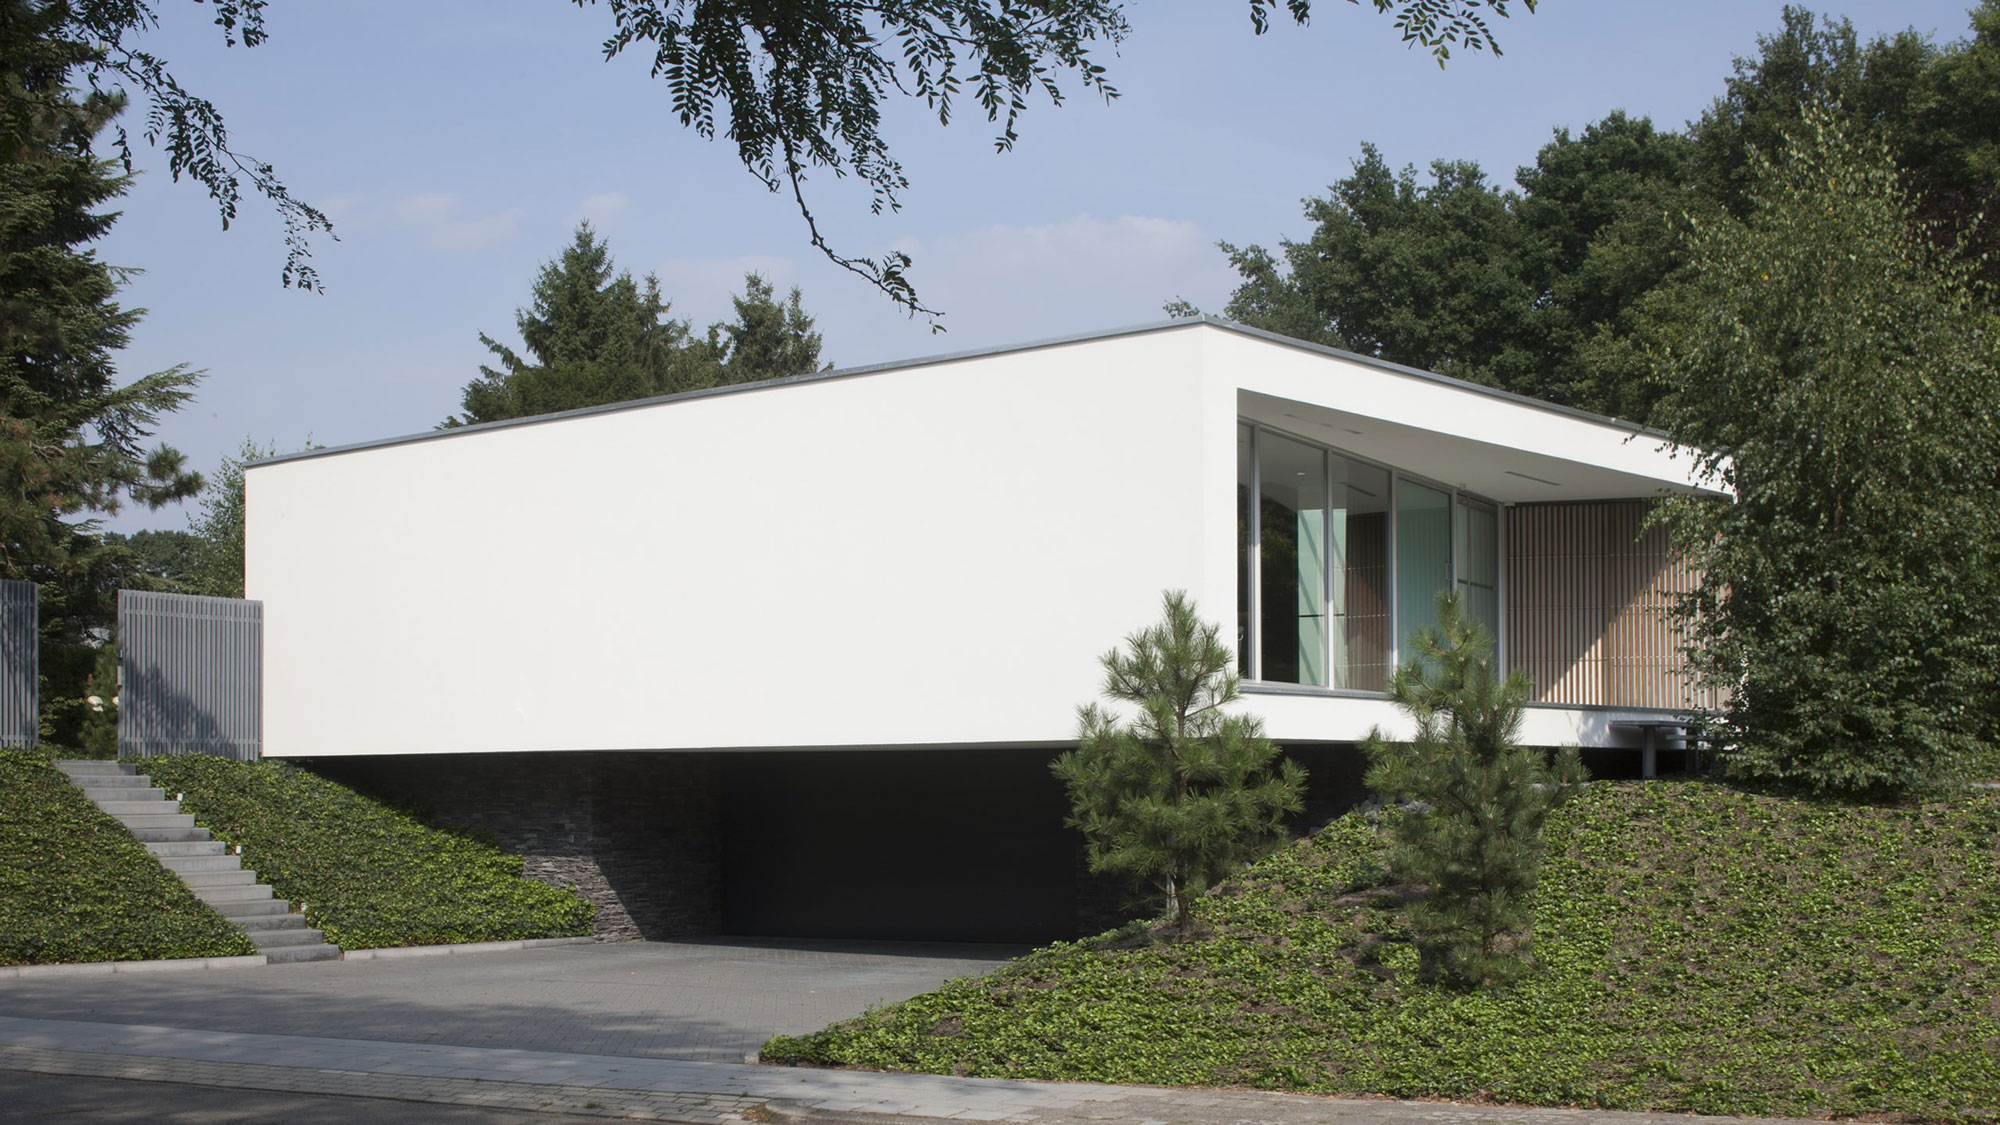 Boxed Villa Spee Haelen with Panoramic Windows by Lab32 architecten-02